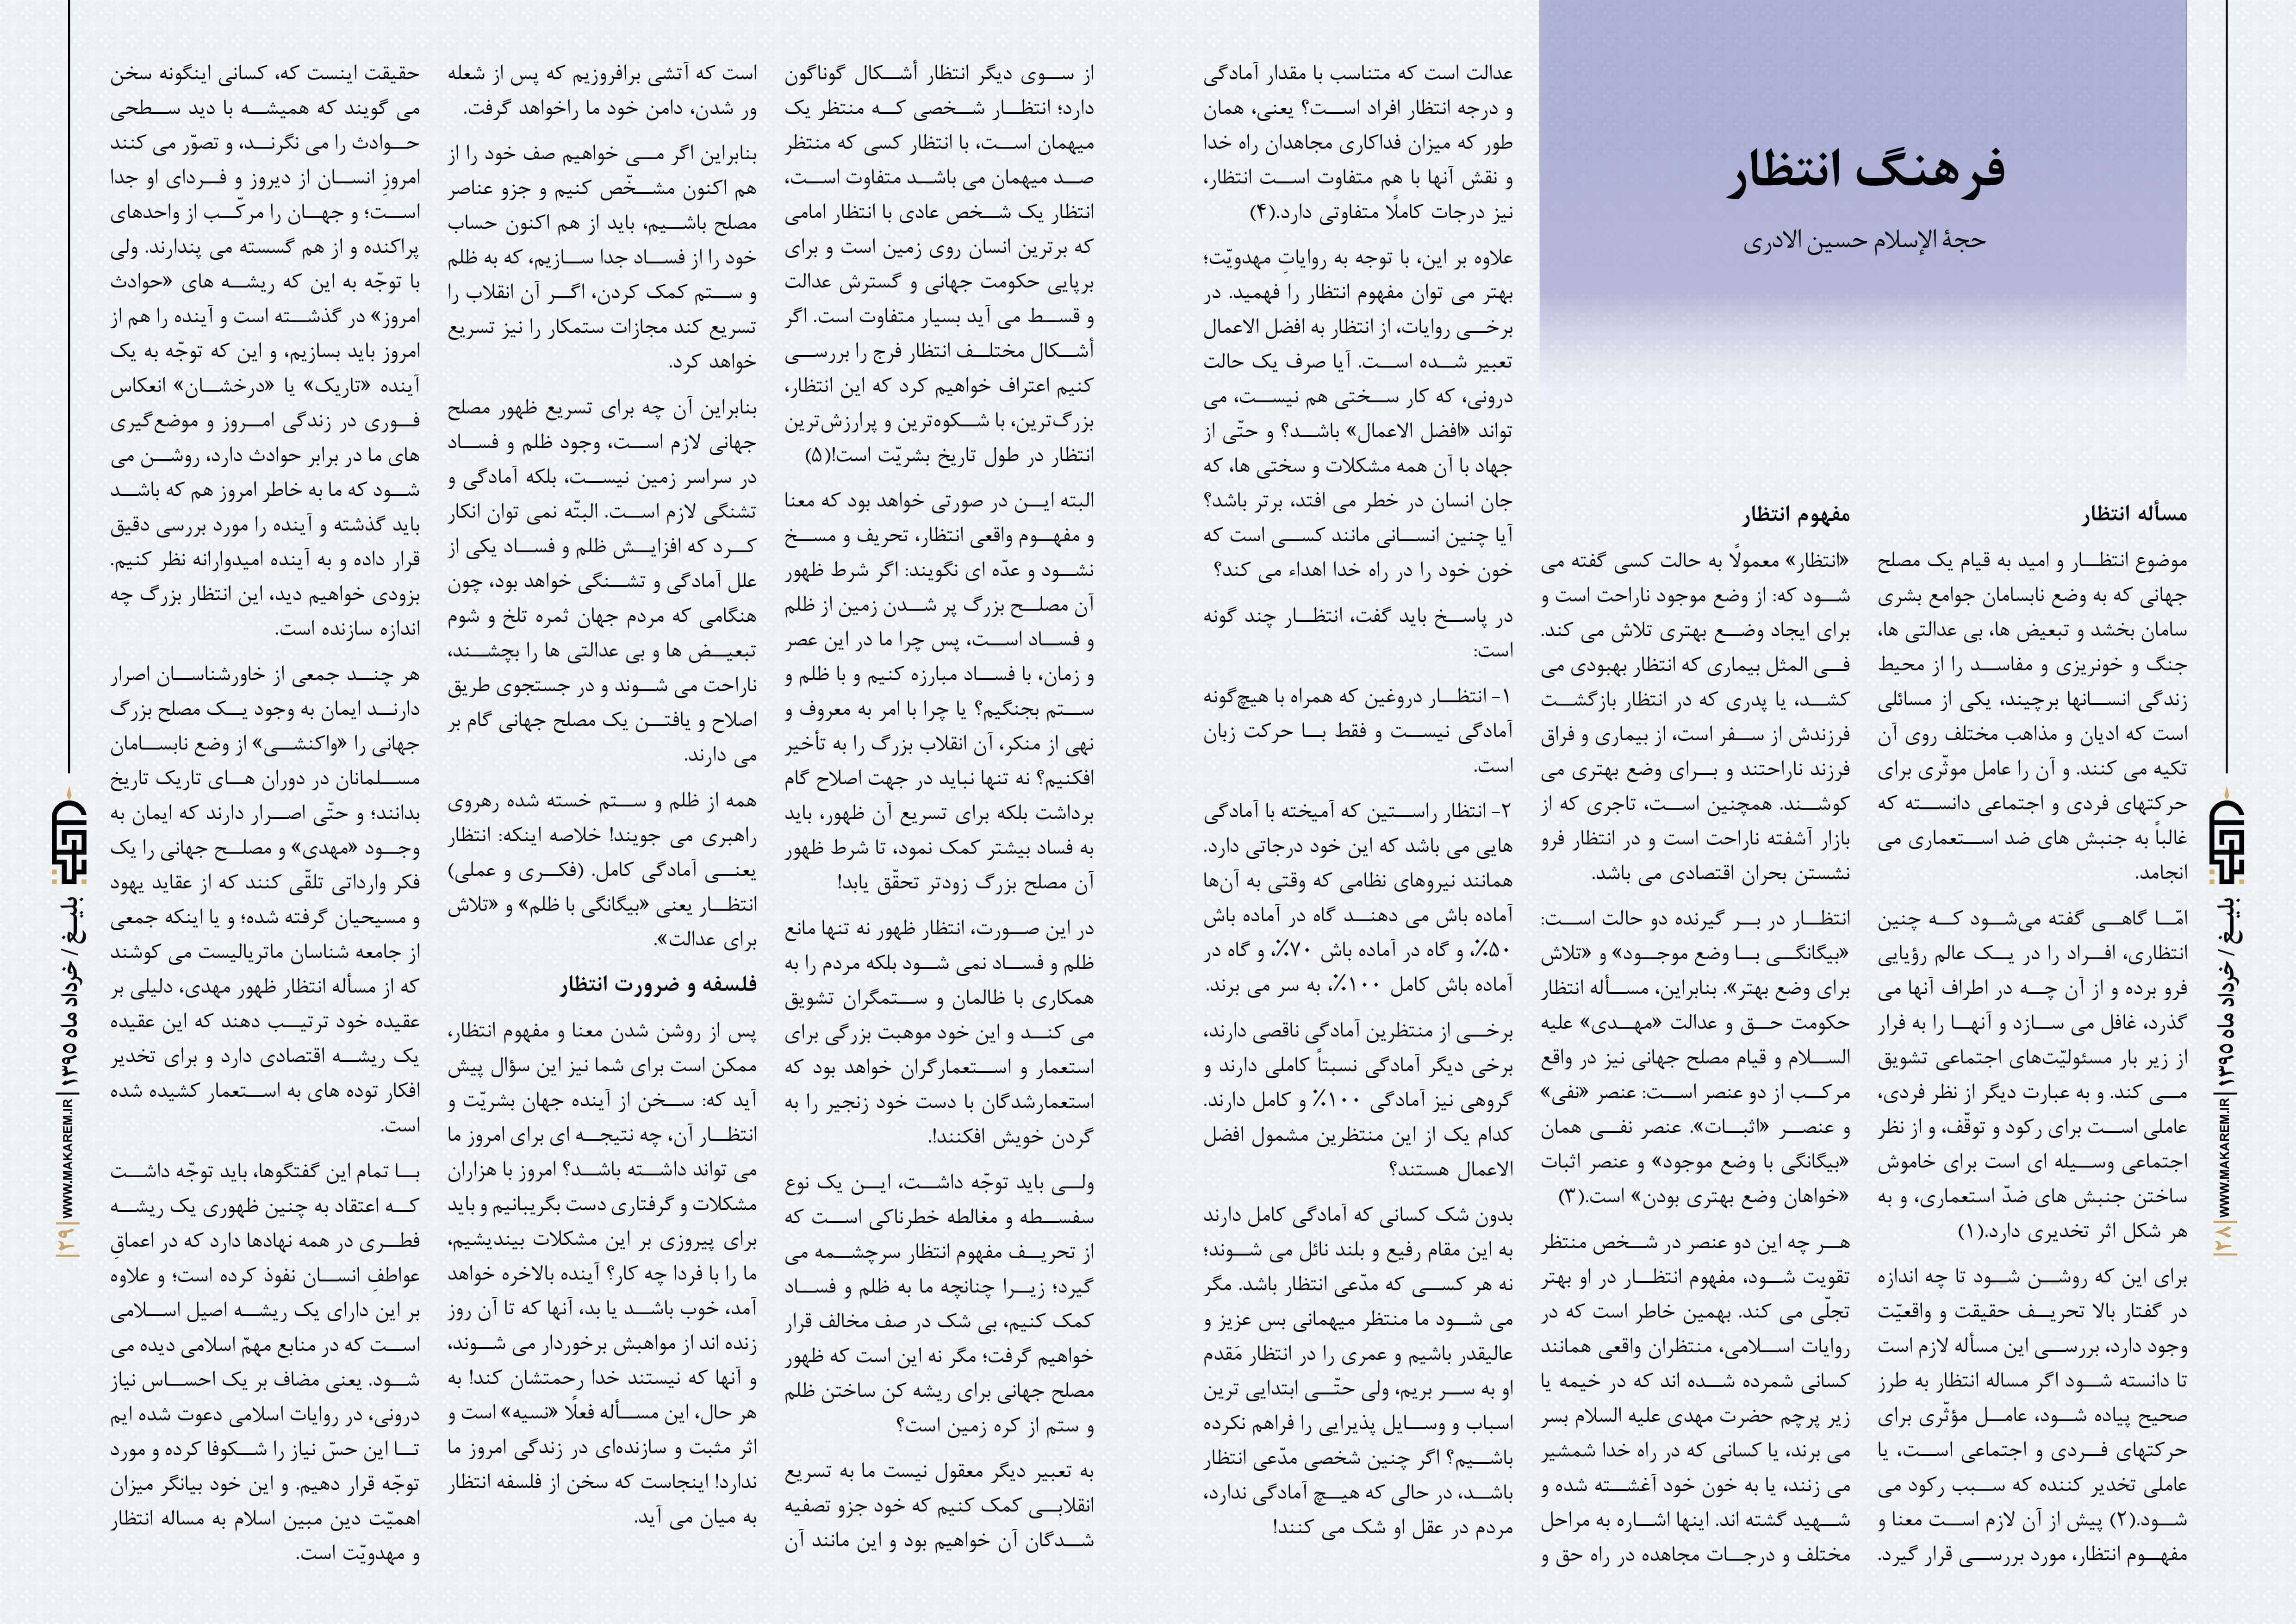 بلیغ 15-مدرسه الامام امیر المومنین (ع)